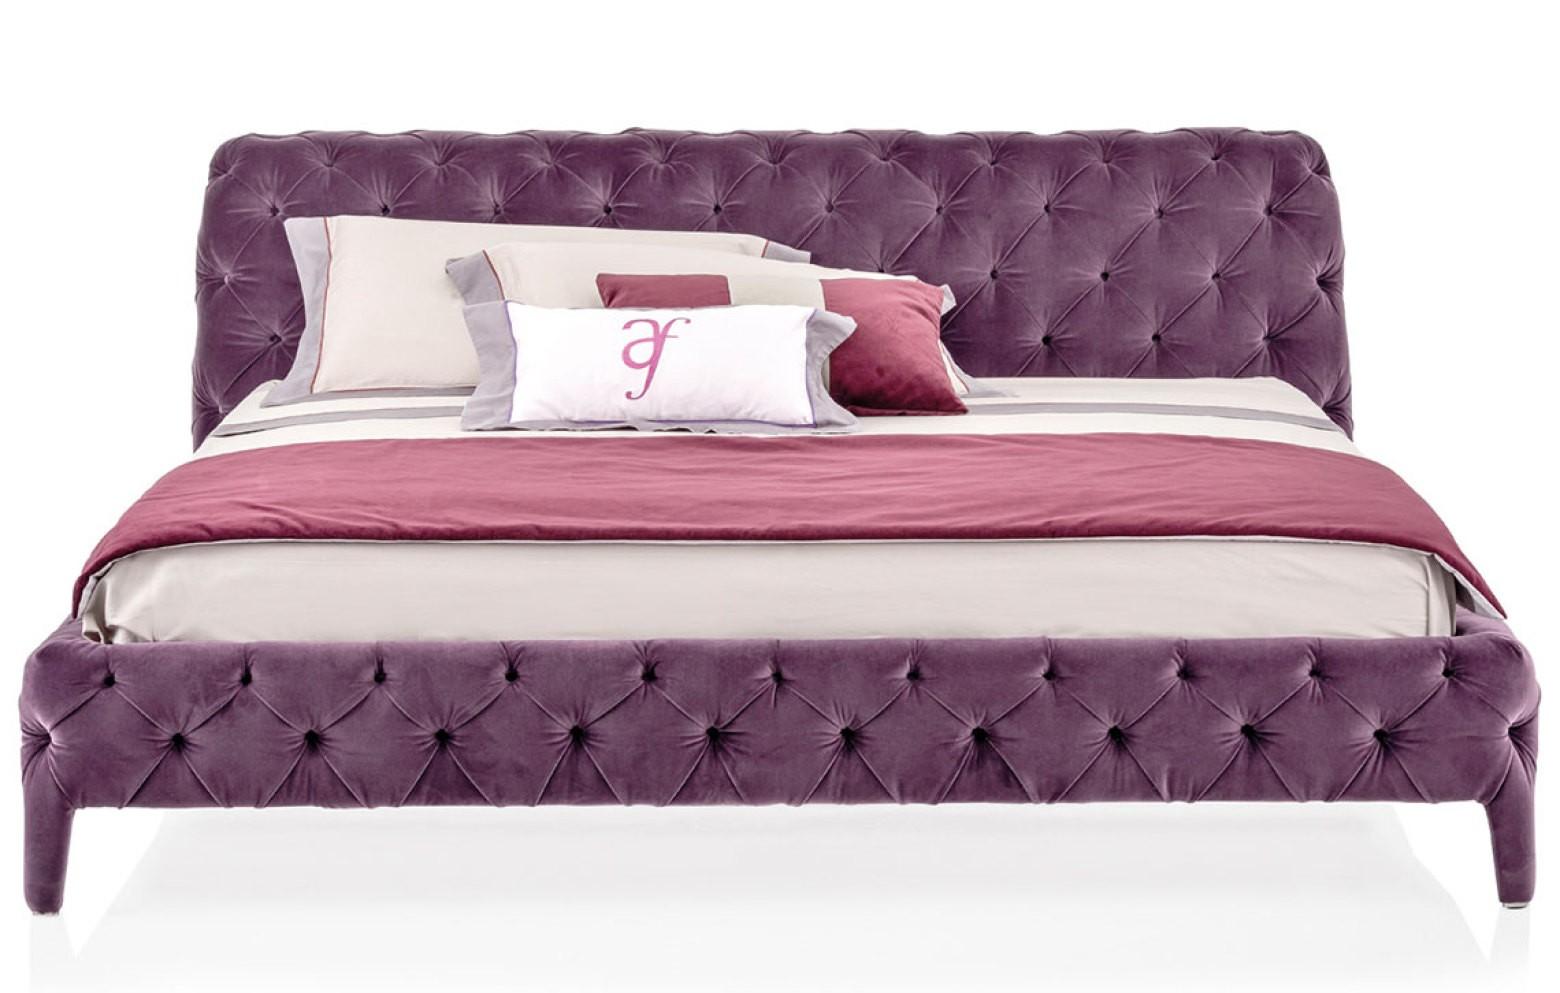 windsor dream betten betten schr nke who 39 s perfect. Black Bedroom Furniture Sets. Home Design Ideas